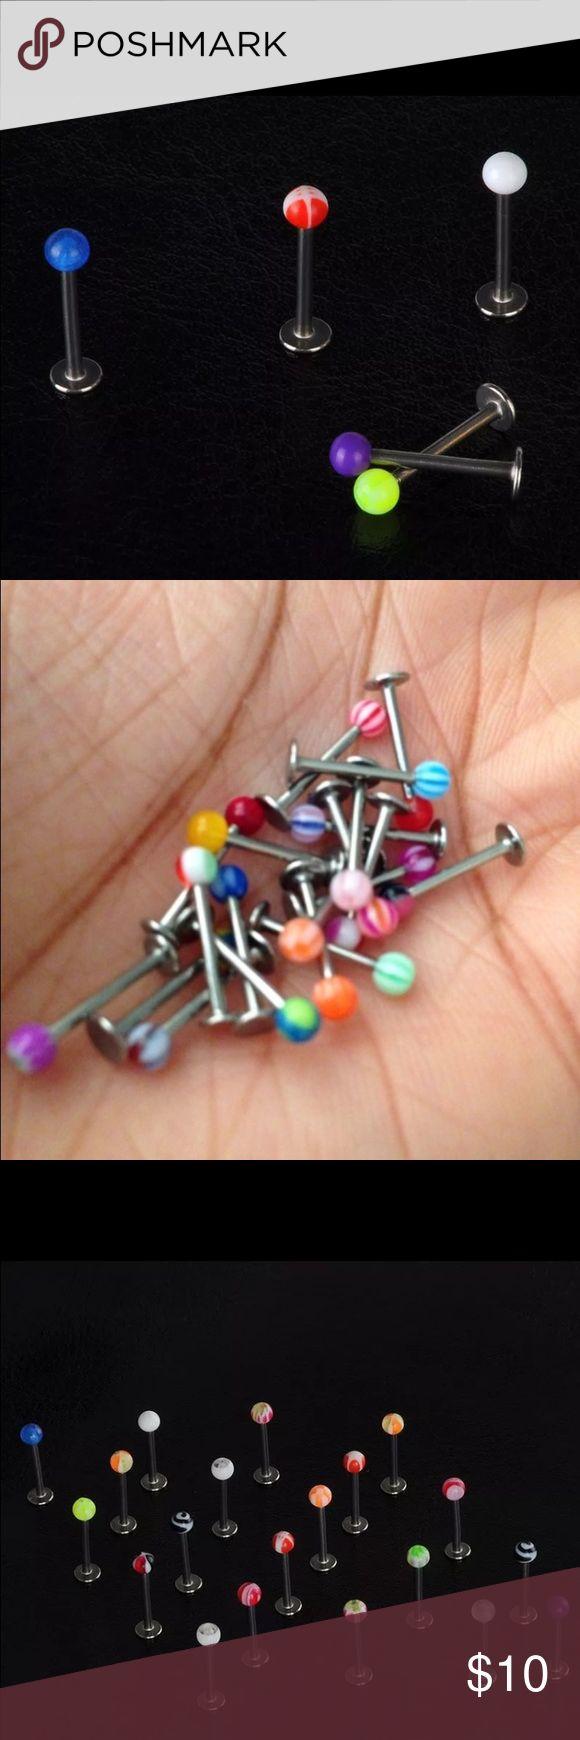 Lip Labret Monroe piercing 5 pcs Stainless steel 5 pieces Stainless steel Color Balls Lip Bar Labret Lip Stud Body Piercing Jewelry Stainless Steel  5 pieces Lip Bars Material: Stainless Steel + Acrylic Bar diameter: app 0.1cm / 18 gauge  Ball diameter: app 0.3cm Total length: app 1.1cm  Package Included: 5 pieces / random colors will be sent! Jewelry Earrings